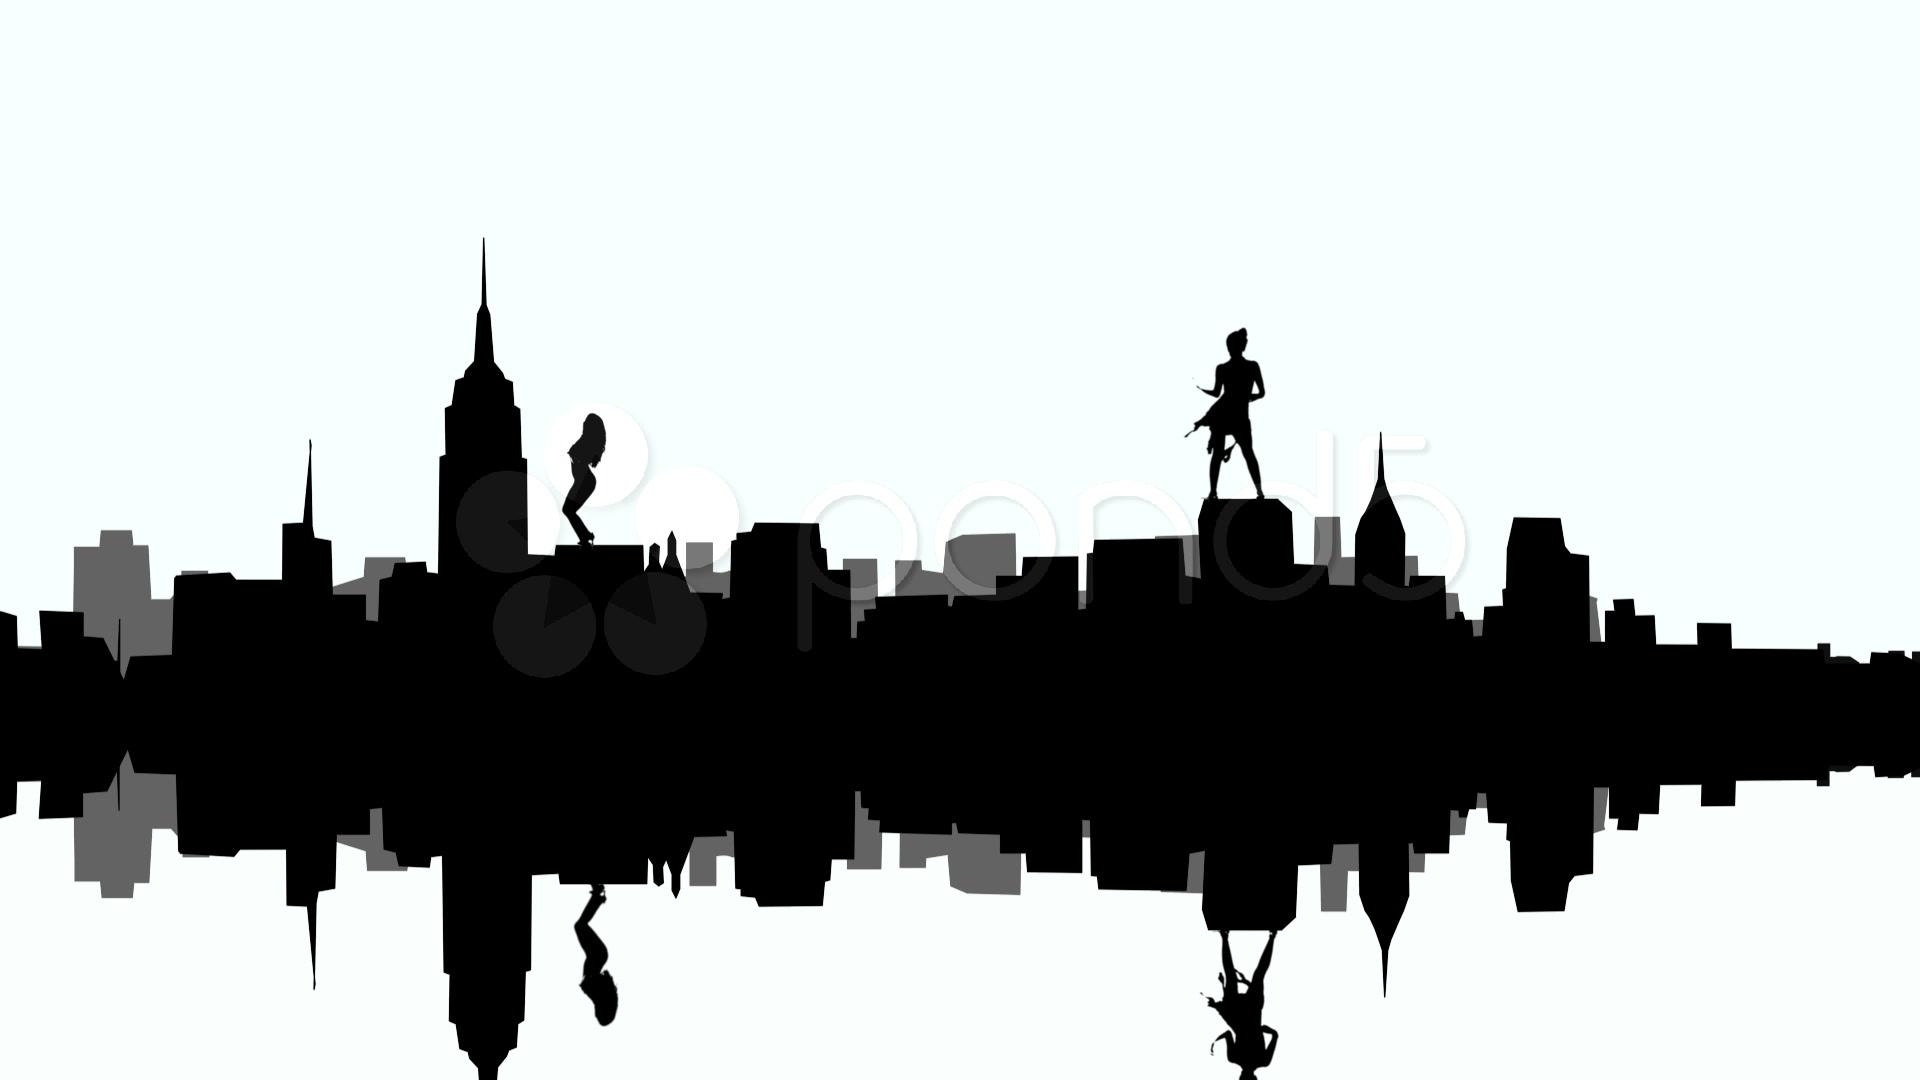 Building clipart gotham city Clipart #7 Skyline clipart Download